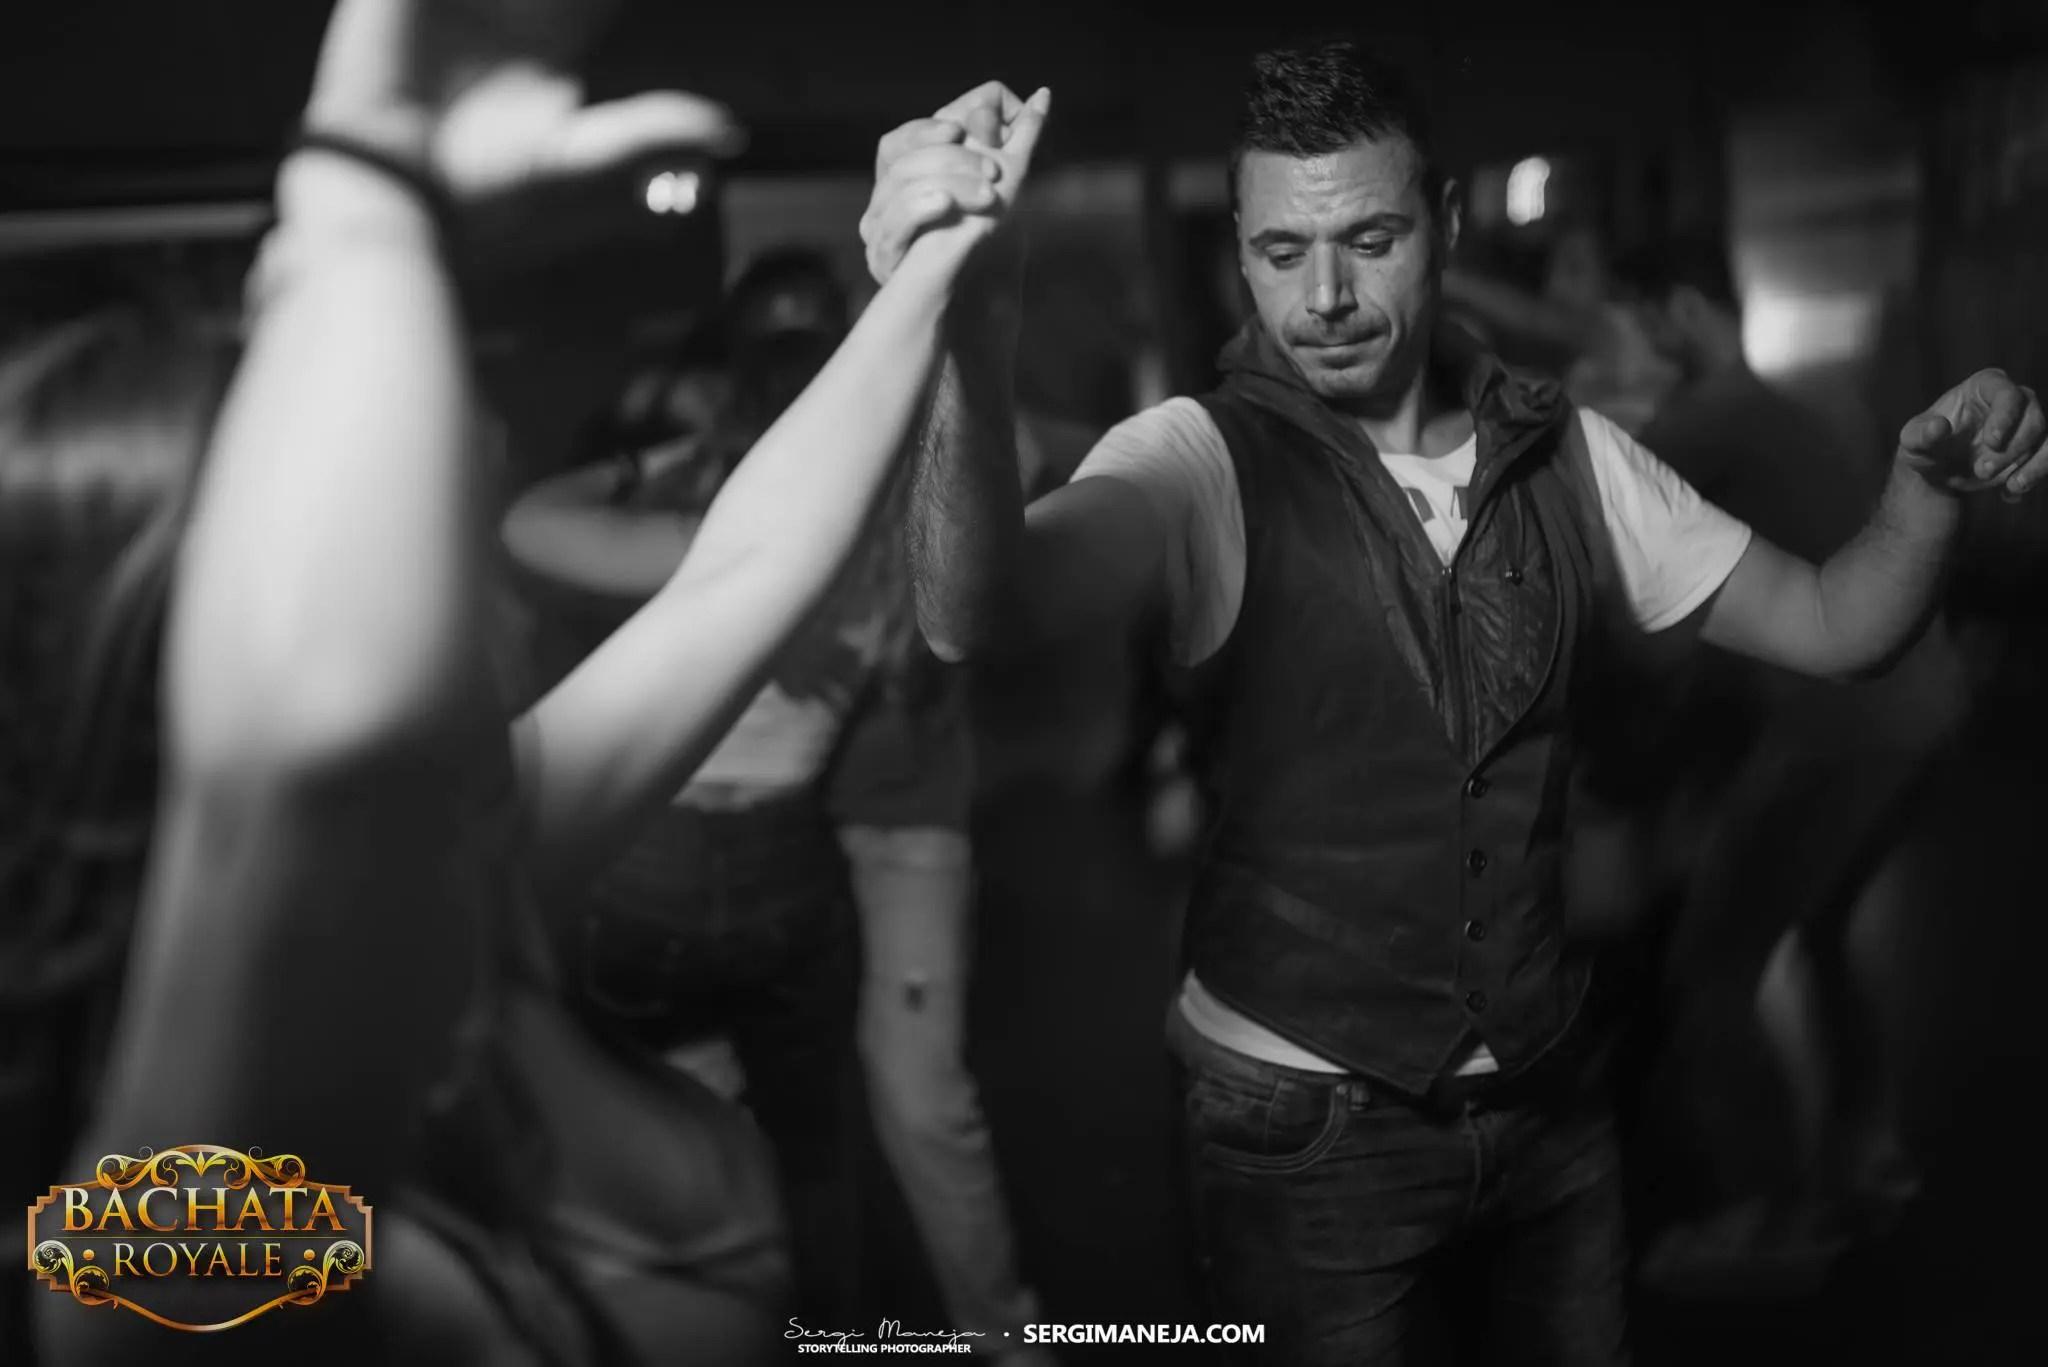 Alex Alberola dancing in social - Let's Dance Bachata